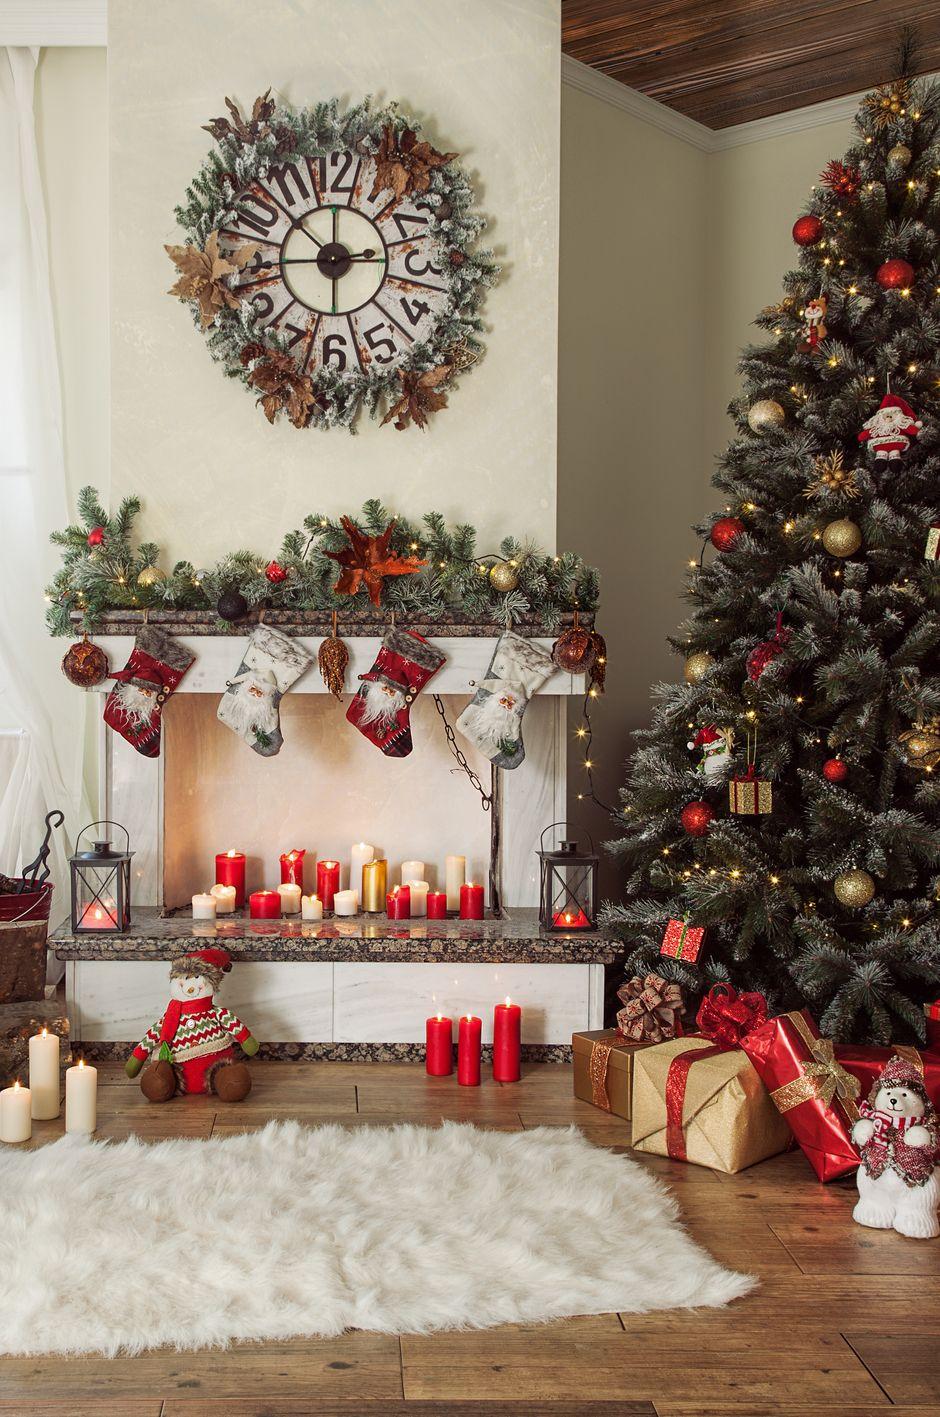 Christmas Bible Verses Christmas Tree And Presents At Home